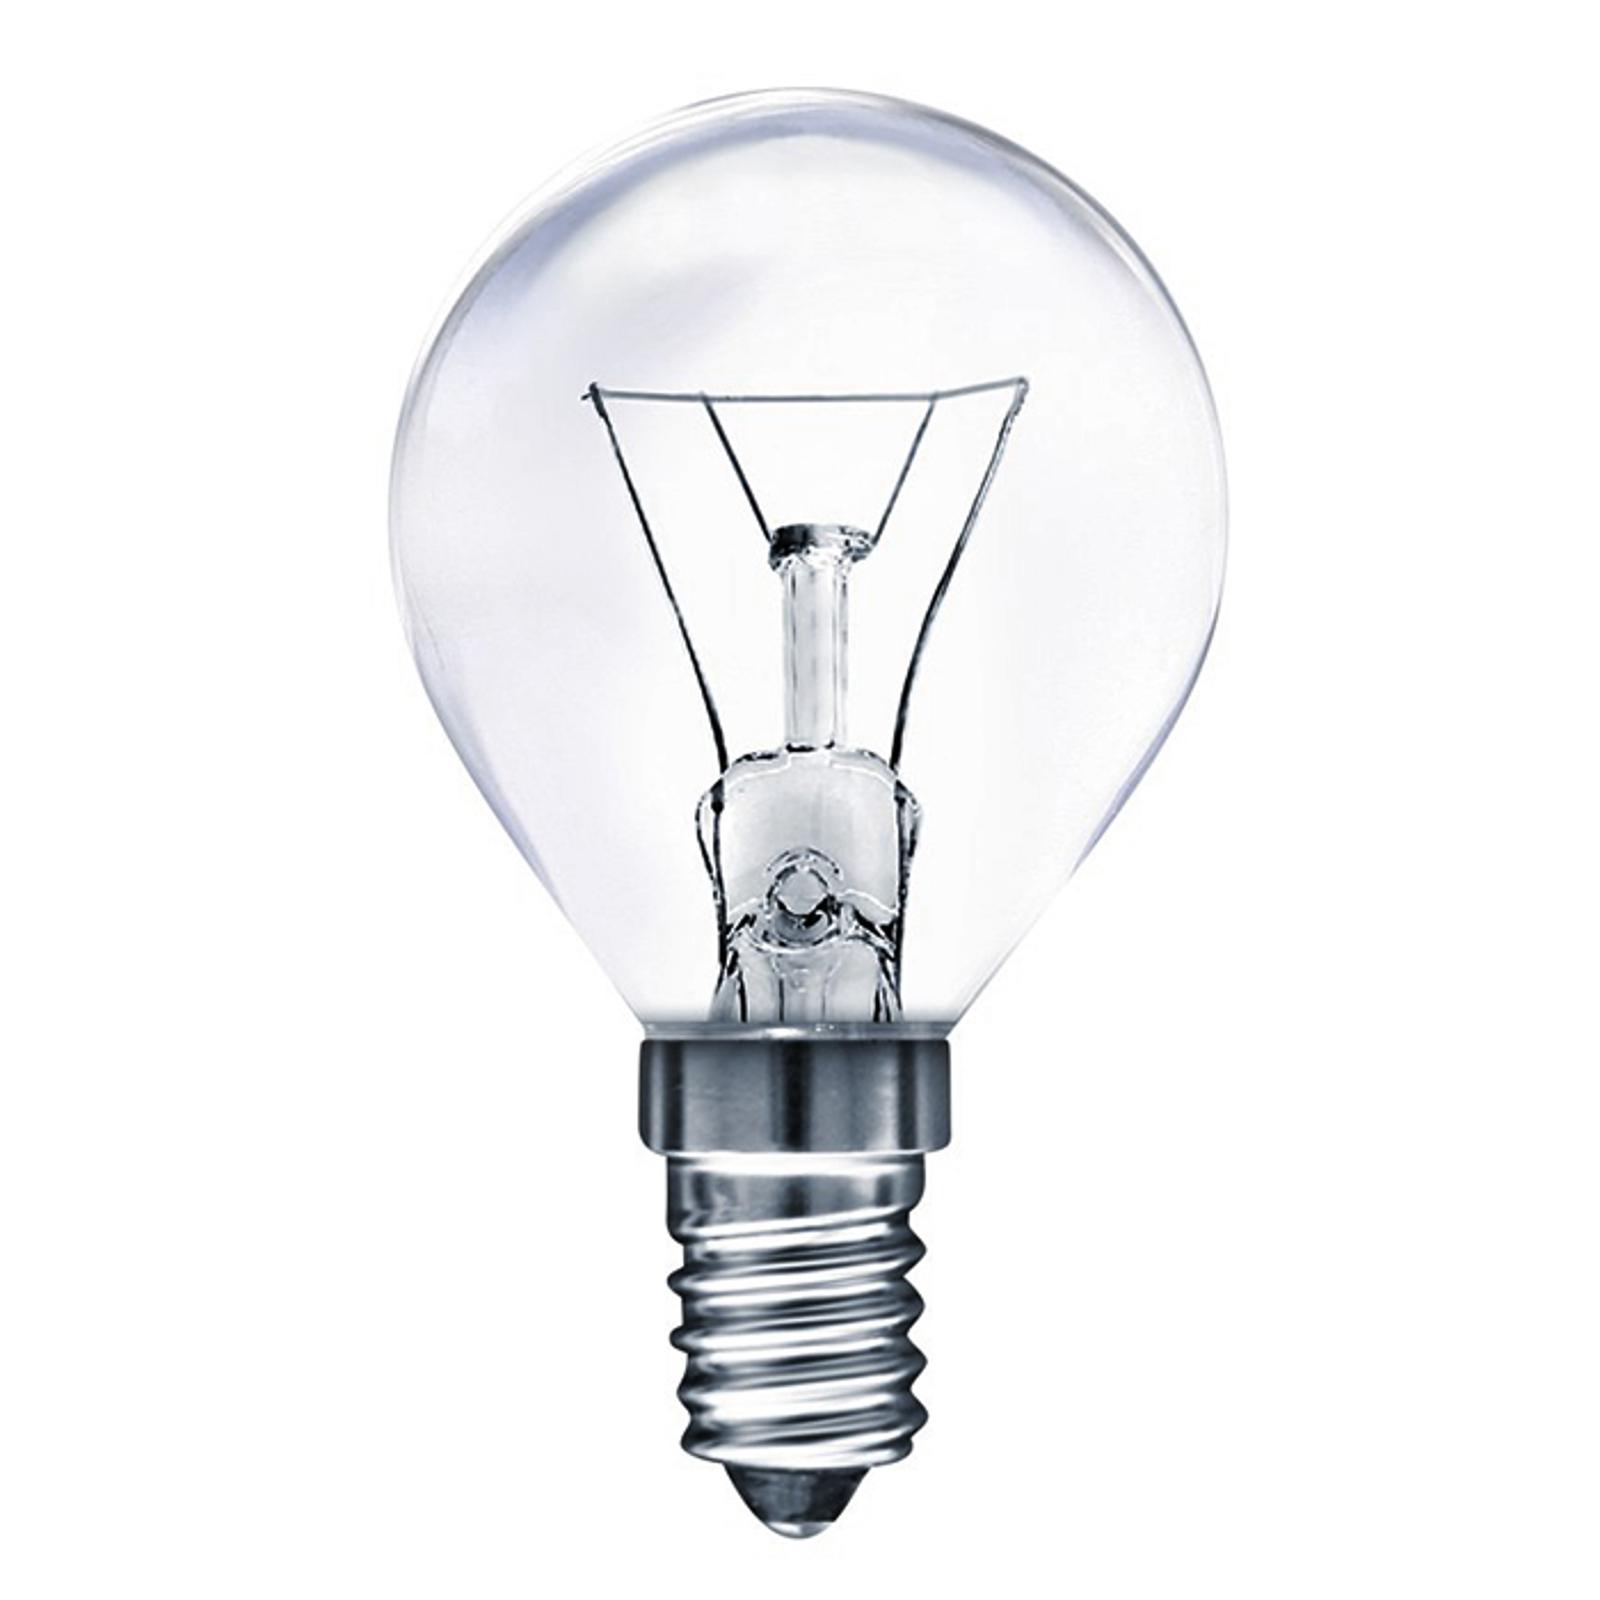 E14 25W Backofenlampe Tropfenform, warmweiß